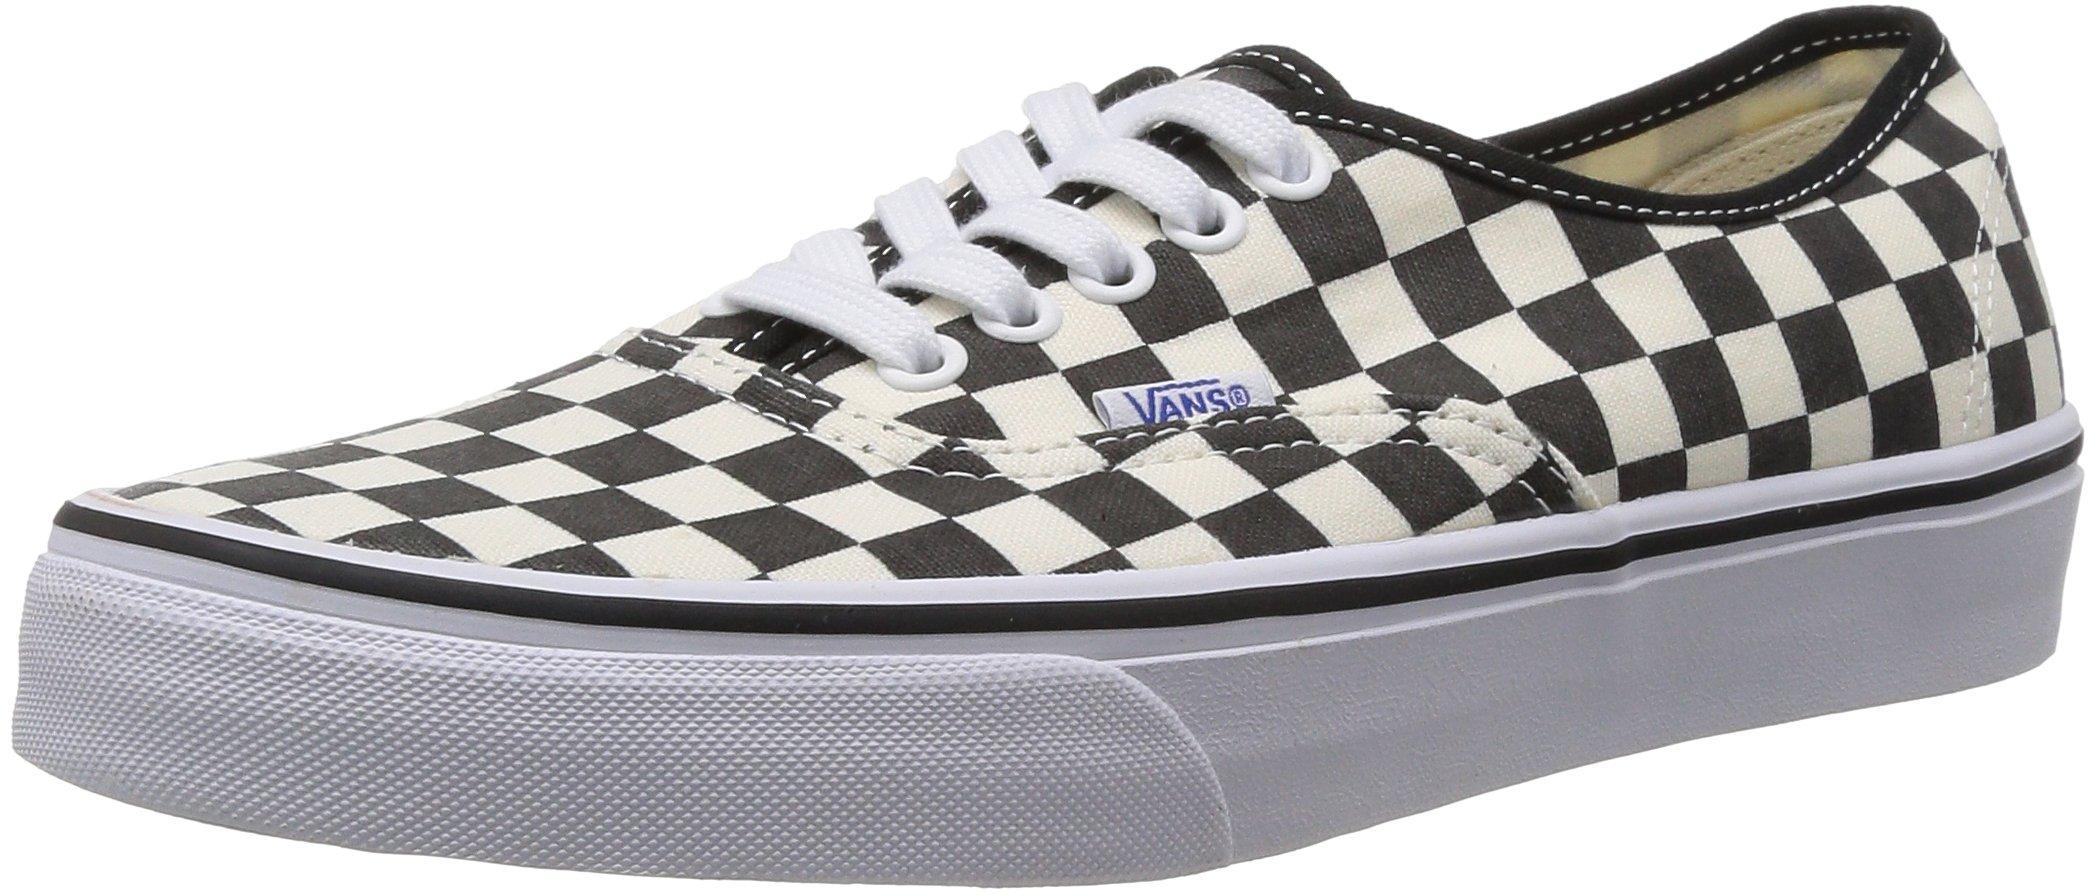 vans checkerboard france